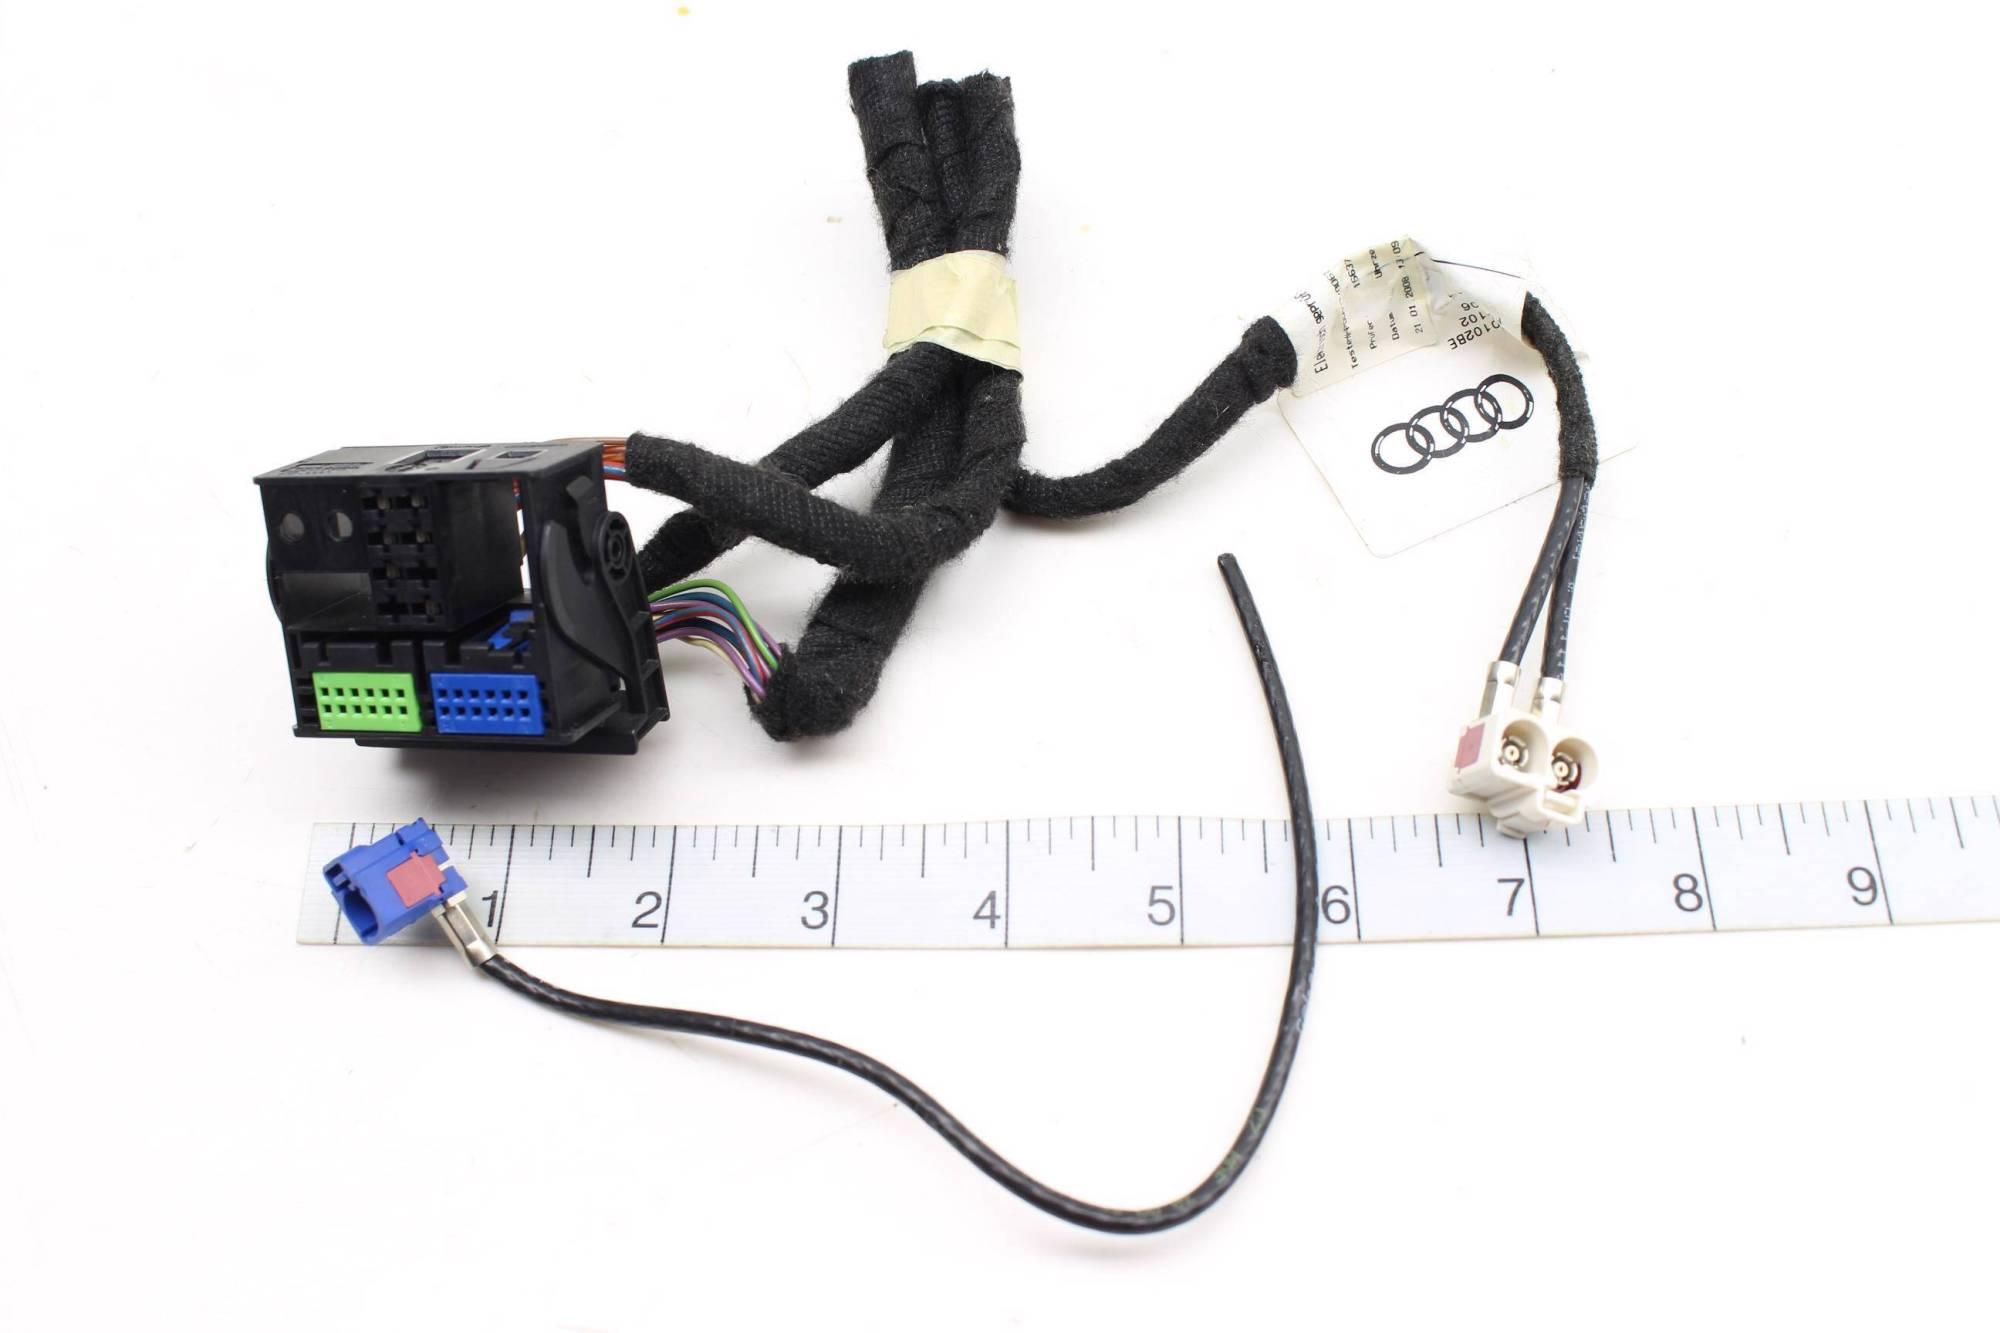 hight resolution of 07 08 audi rs4 b7 rnse rns e radio nav unit wiring harness connector set